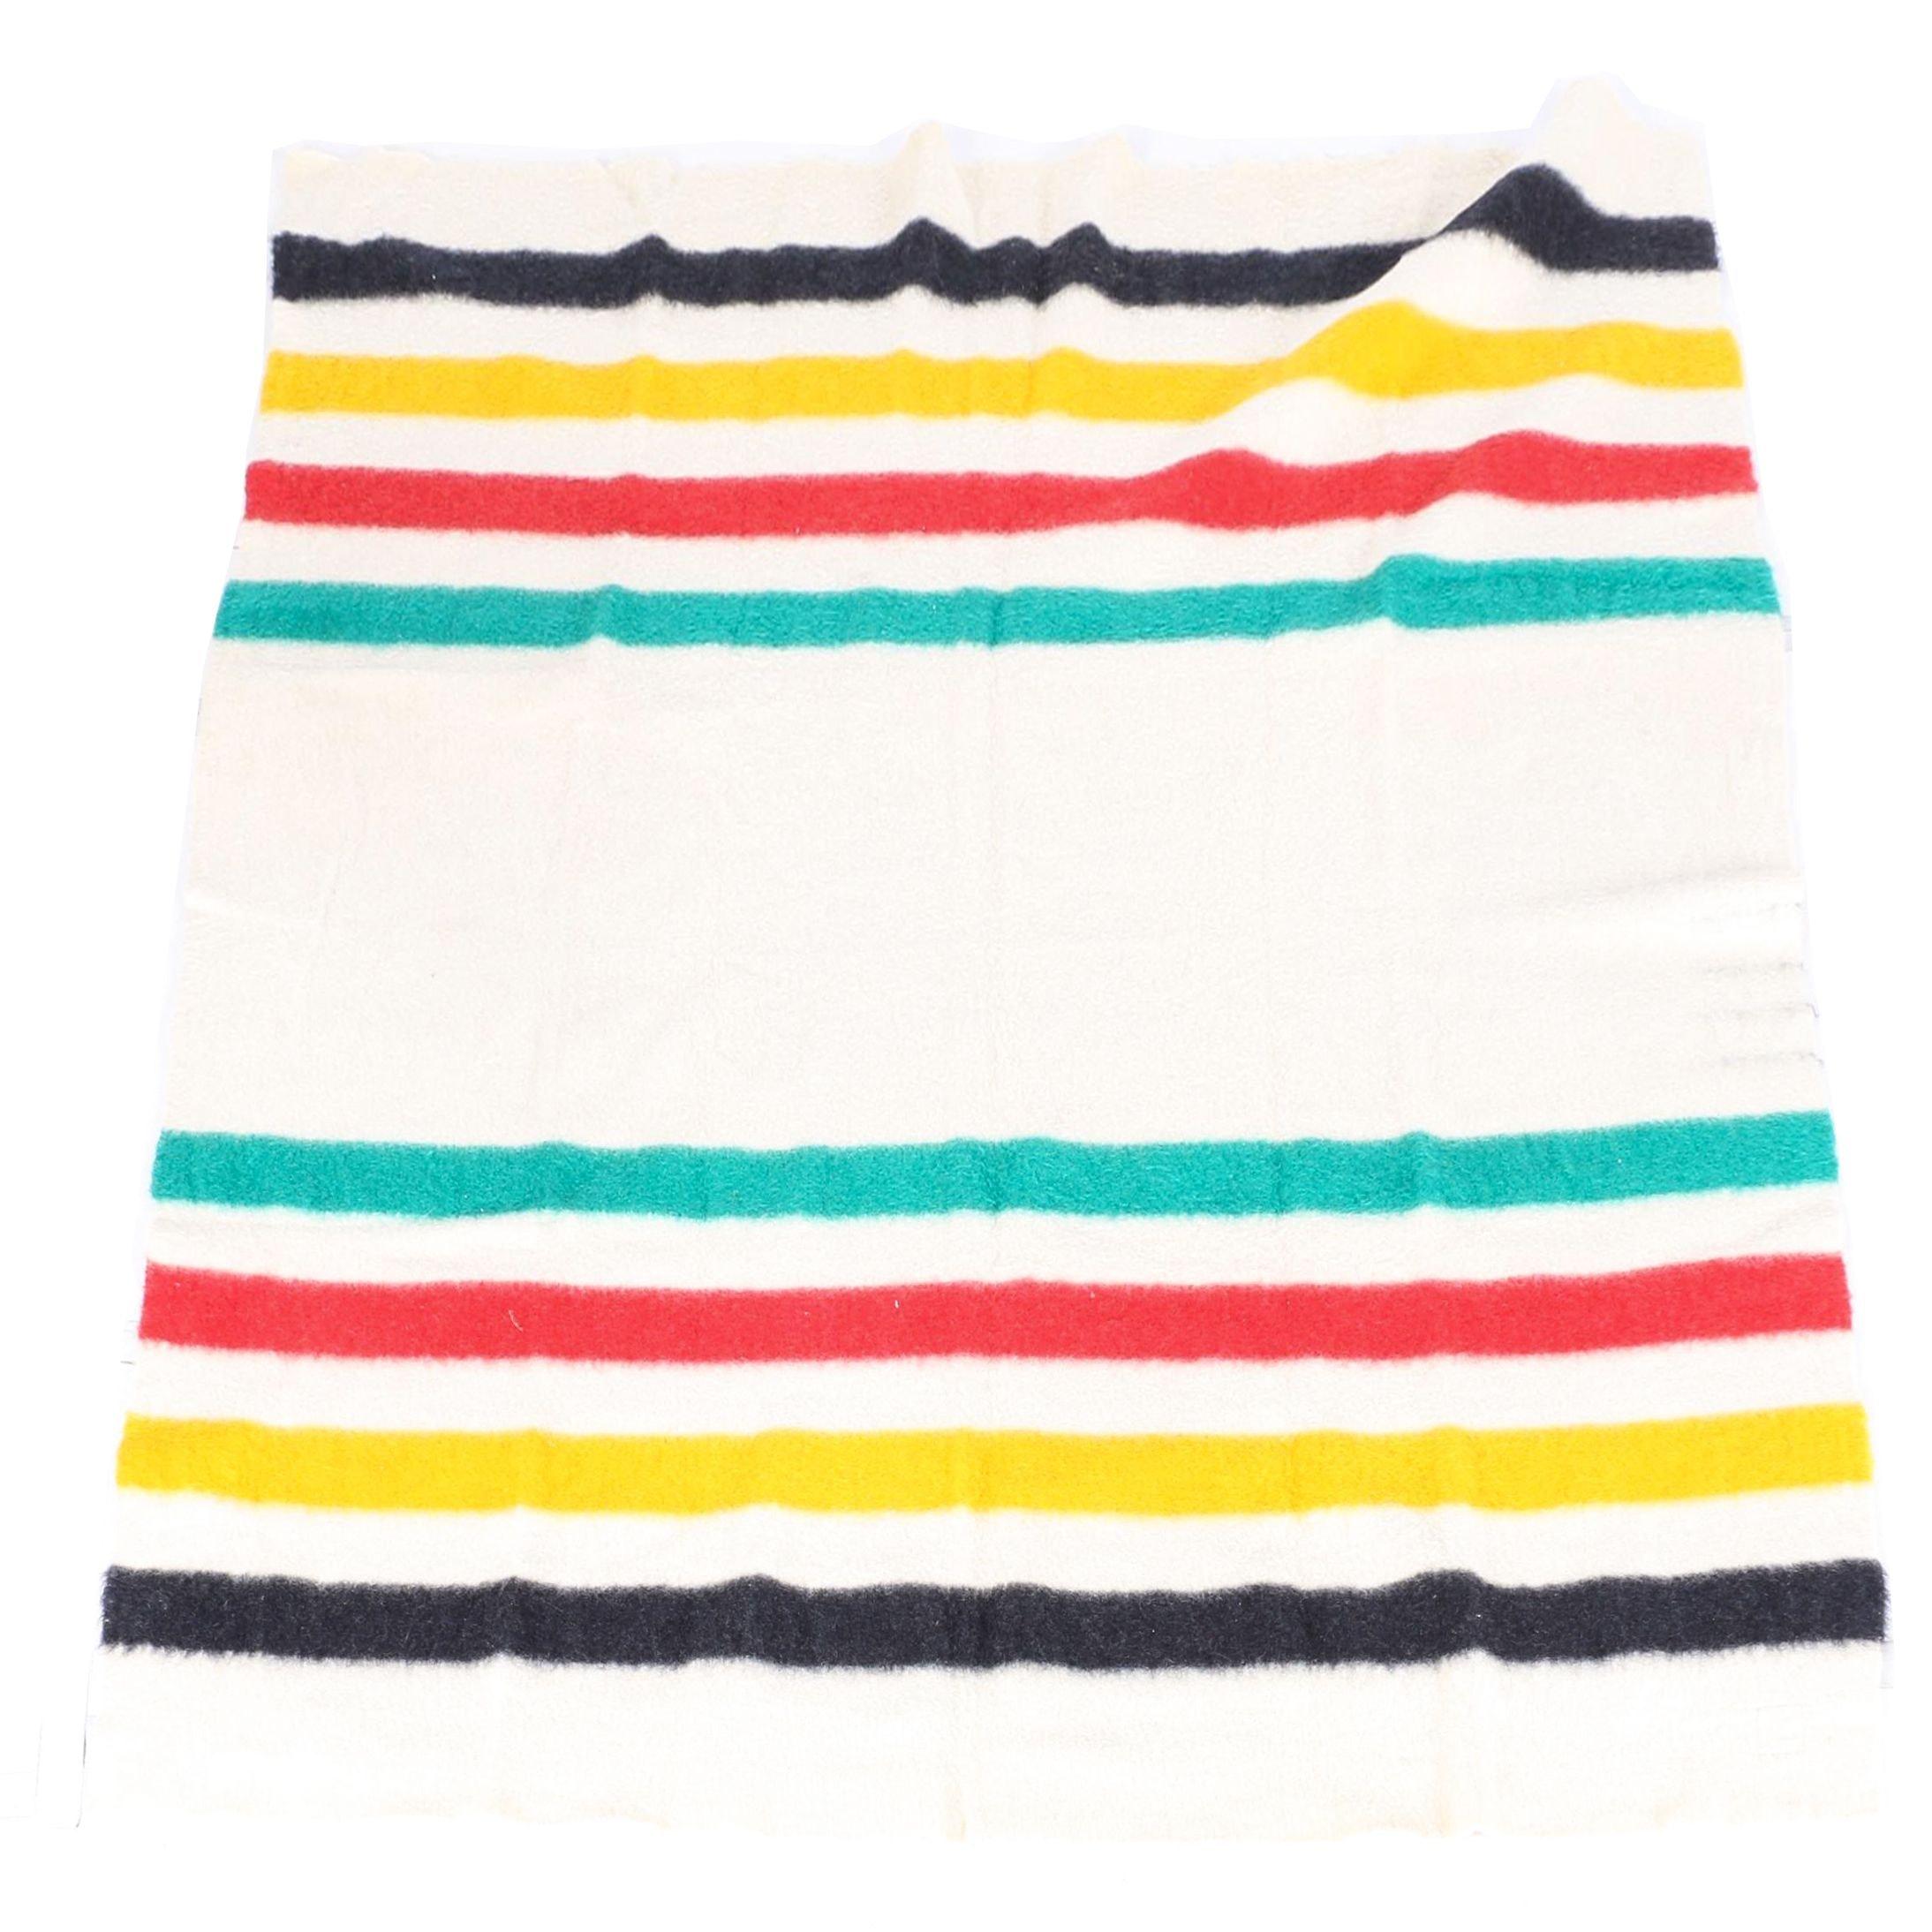 Hudson's Bay Point Wool Blanket